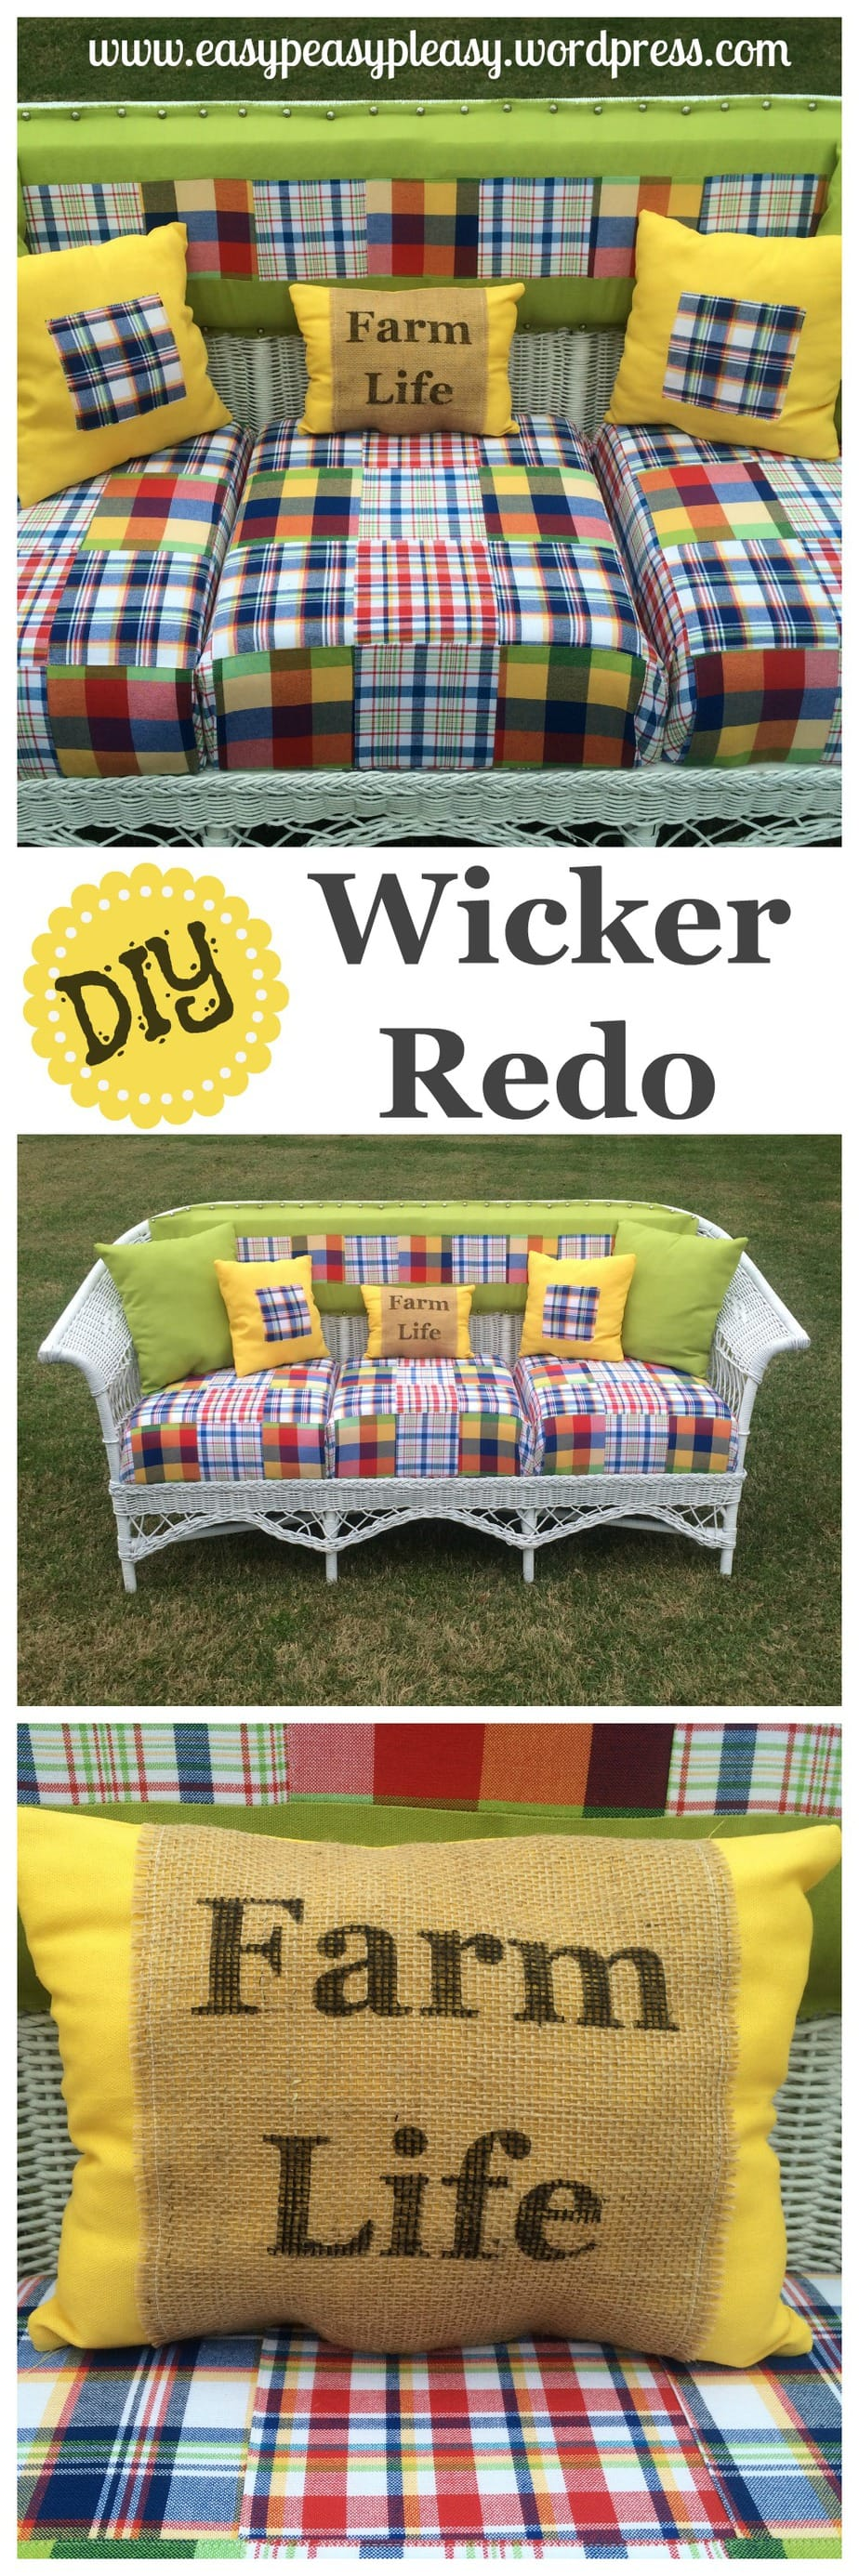 How to restore wicker DIY tutorial